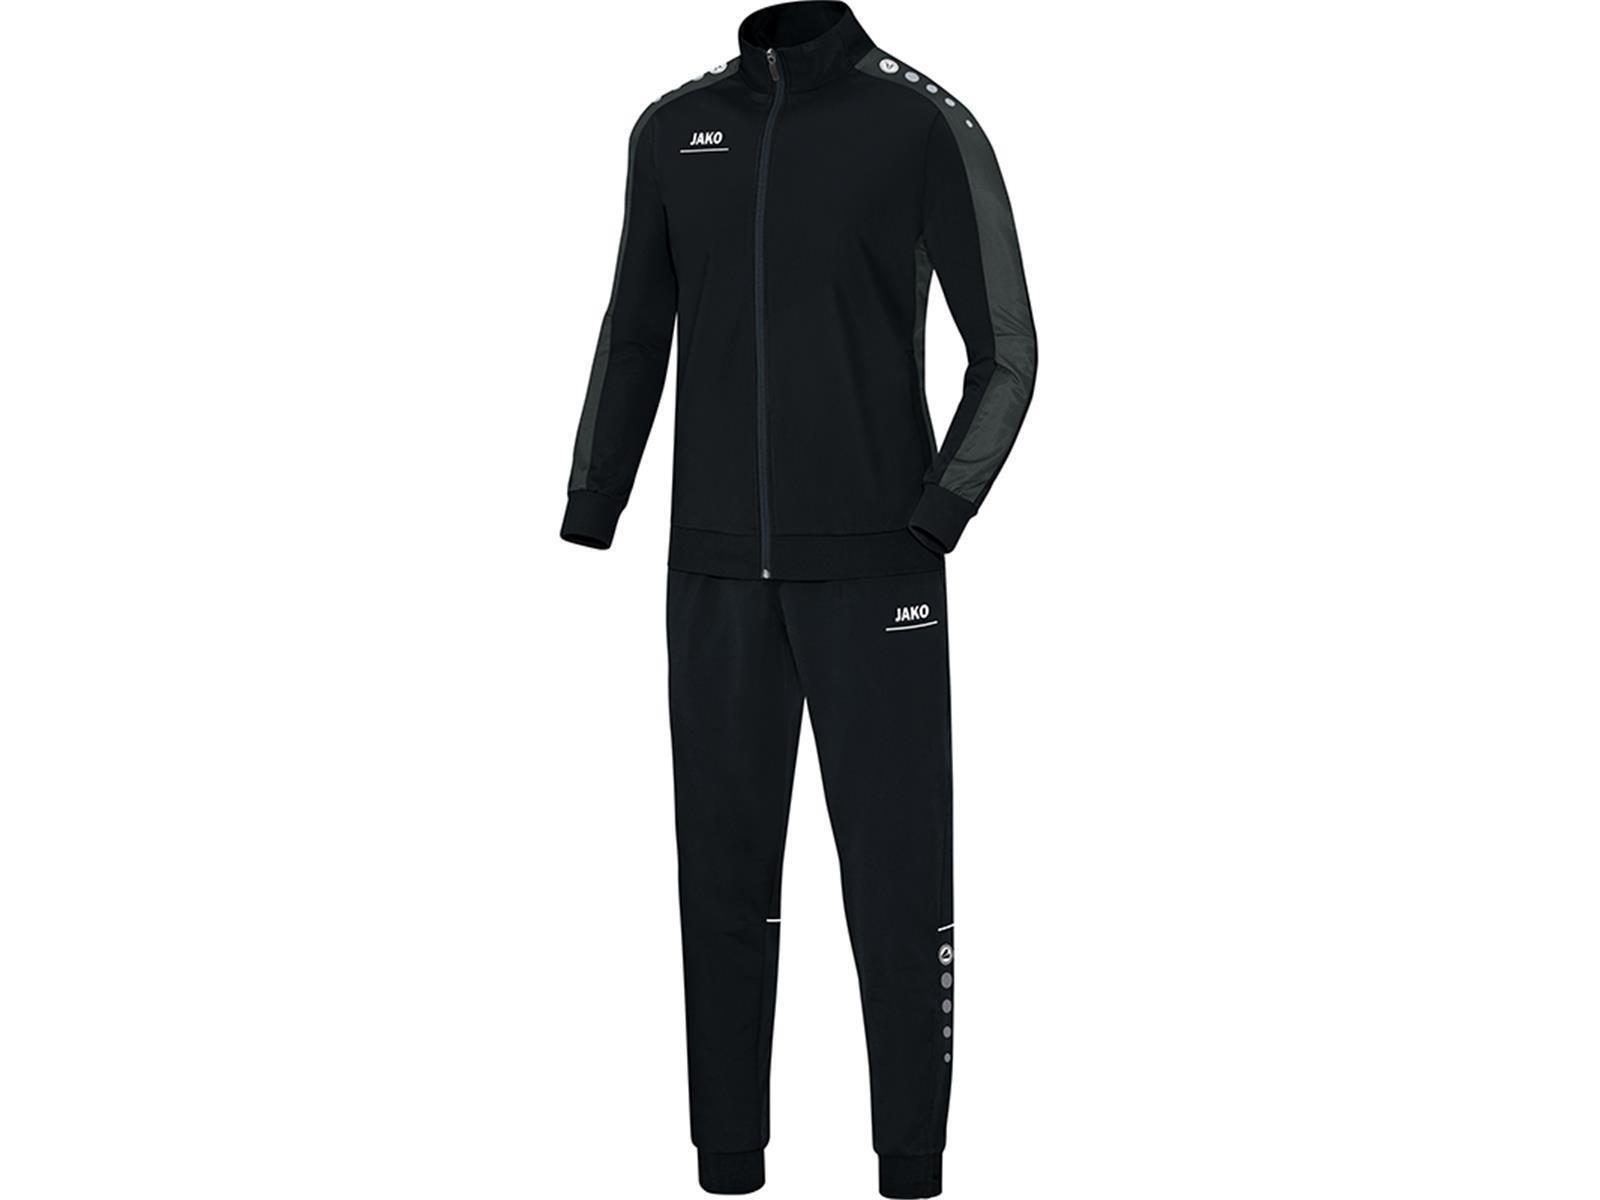 Jako Trainingsanzug Polyester Anzug Striker Sport Fitness Jogging Herren/Kinder schwarz